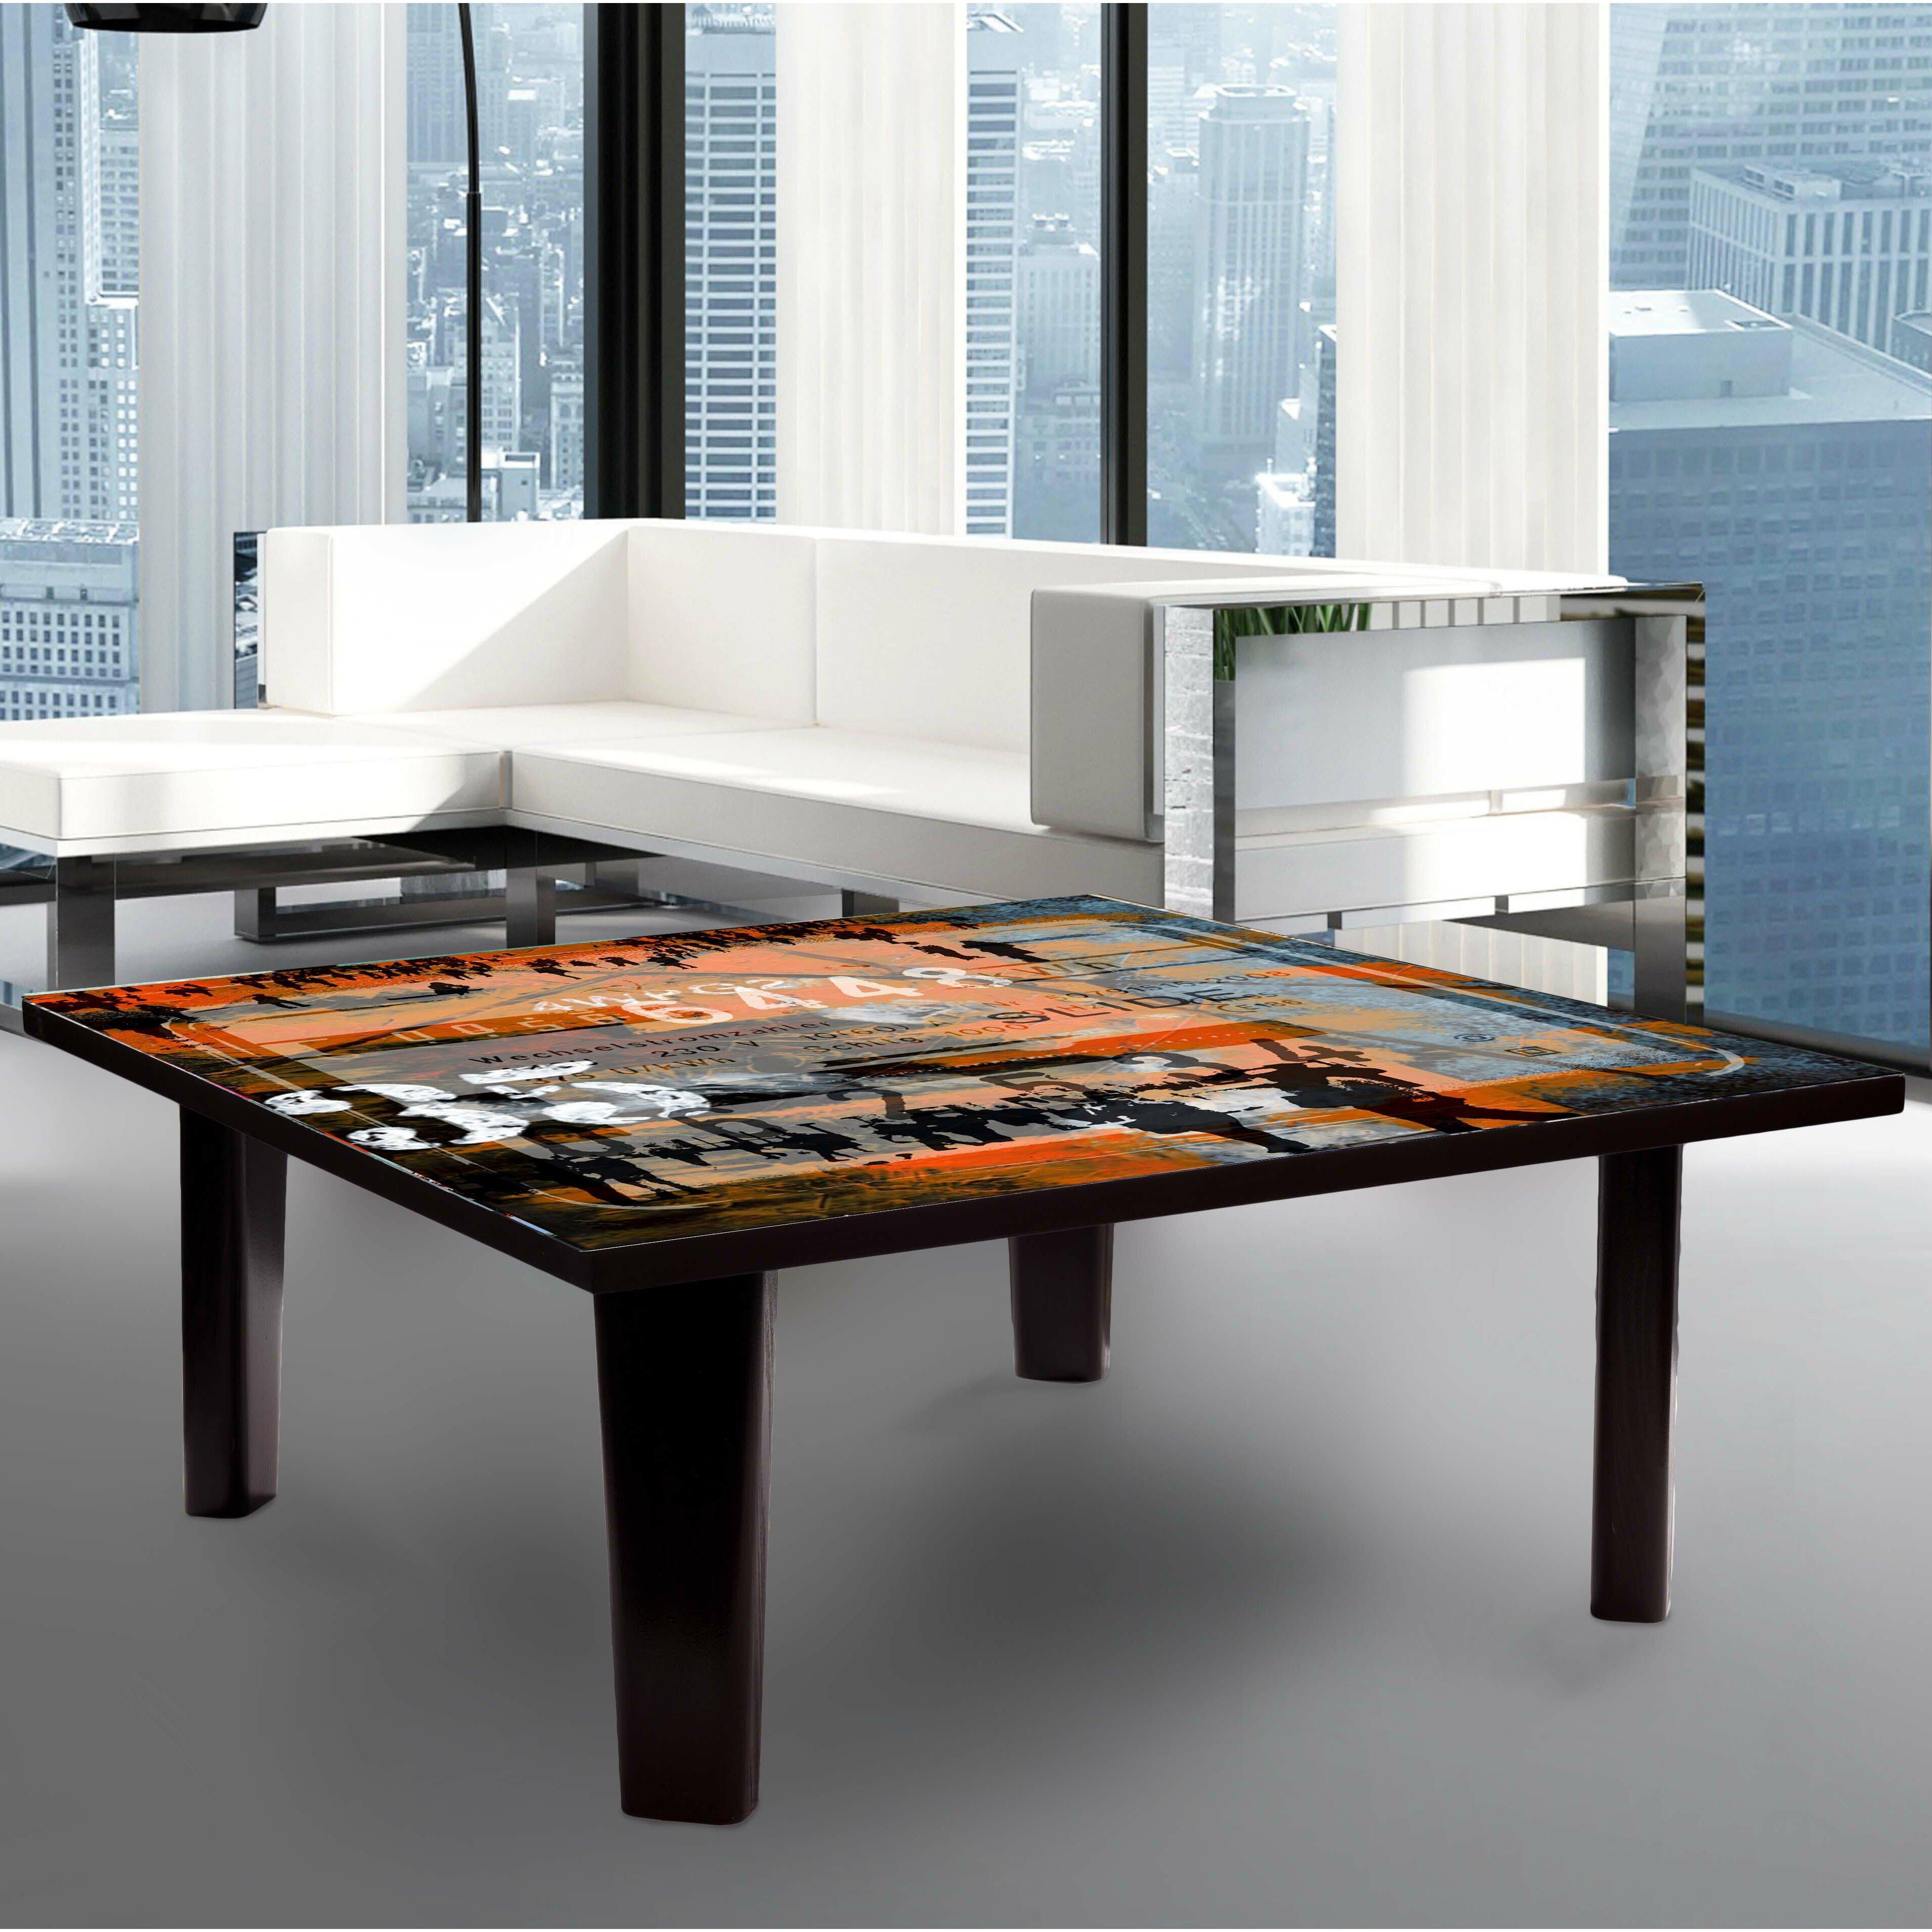 taf decor coffee table wayfair. Black Bedroom Furniture Sets. Home Design Ideas